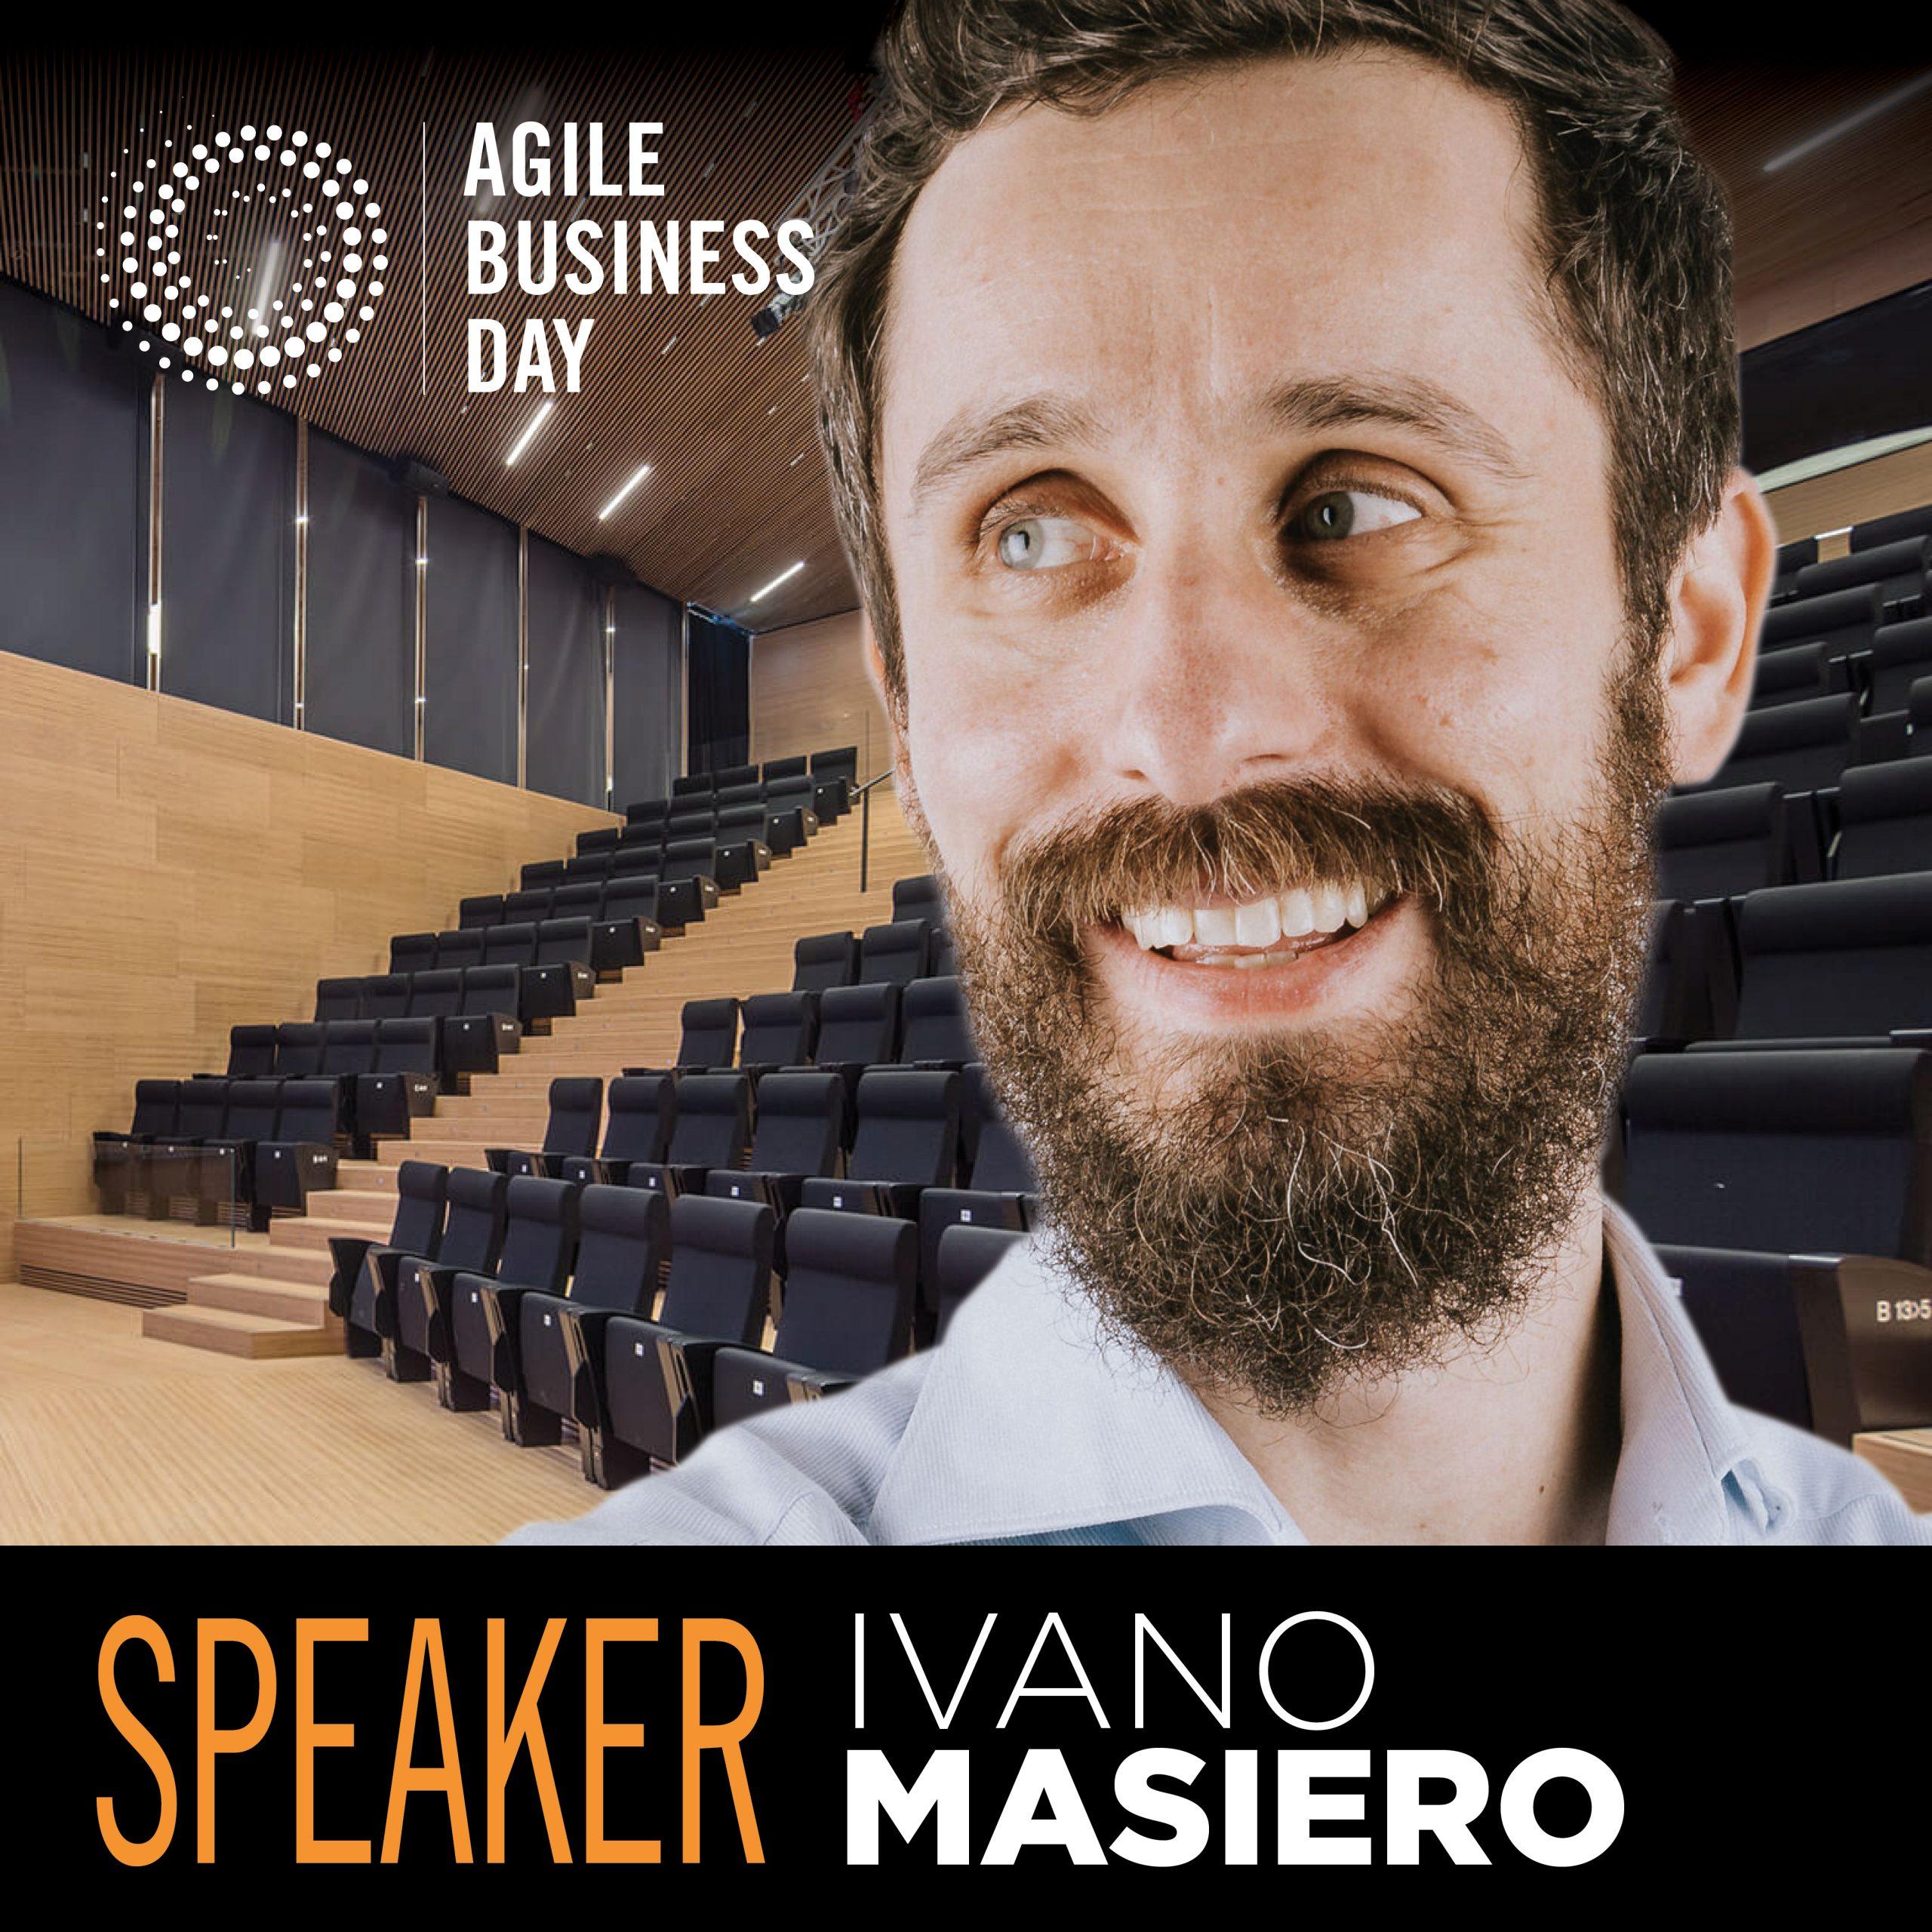 #ABD21 - Ivano Masiero